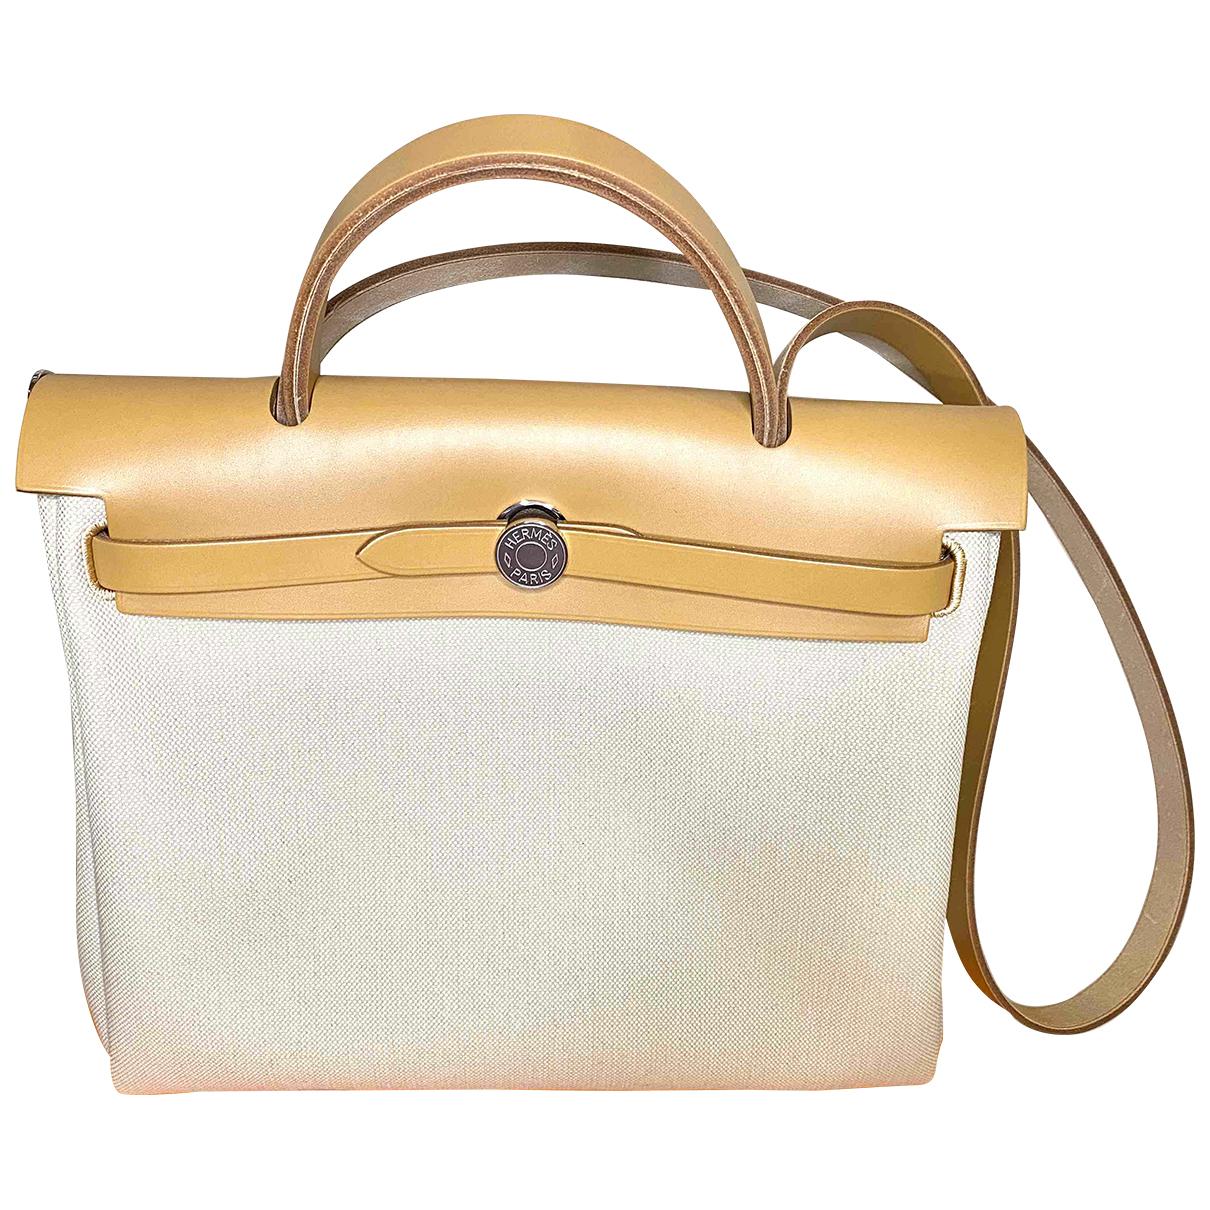 Hermès Herbag Beige Cloth Travel bag for Women N